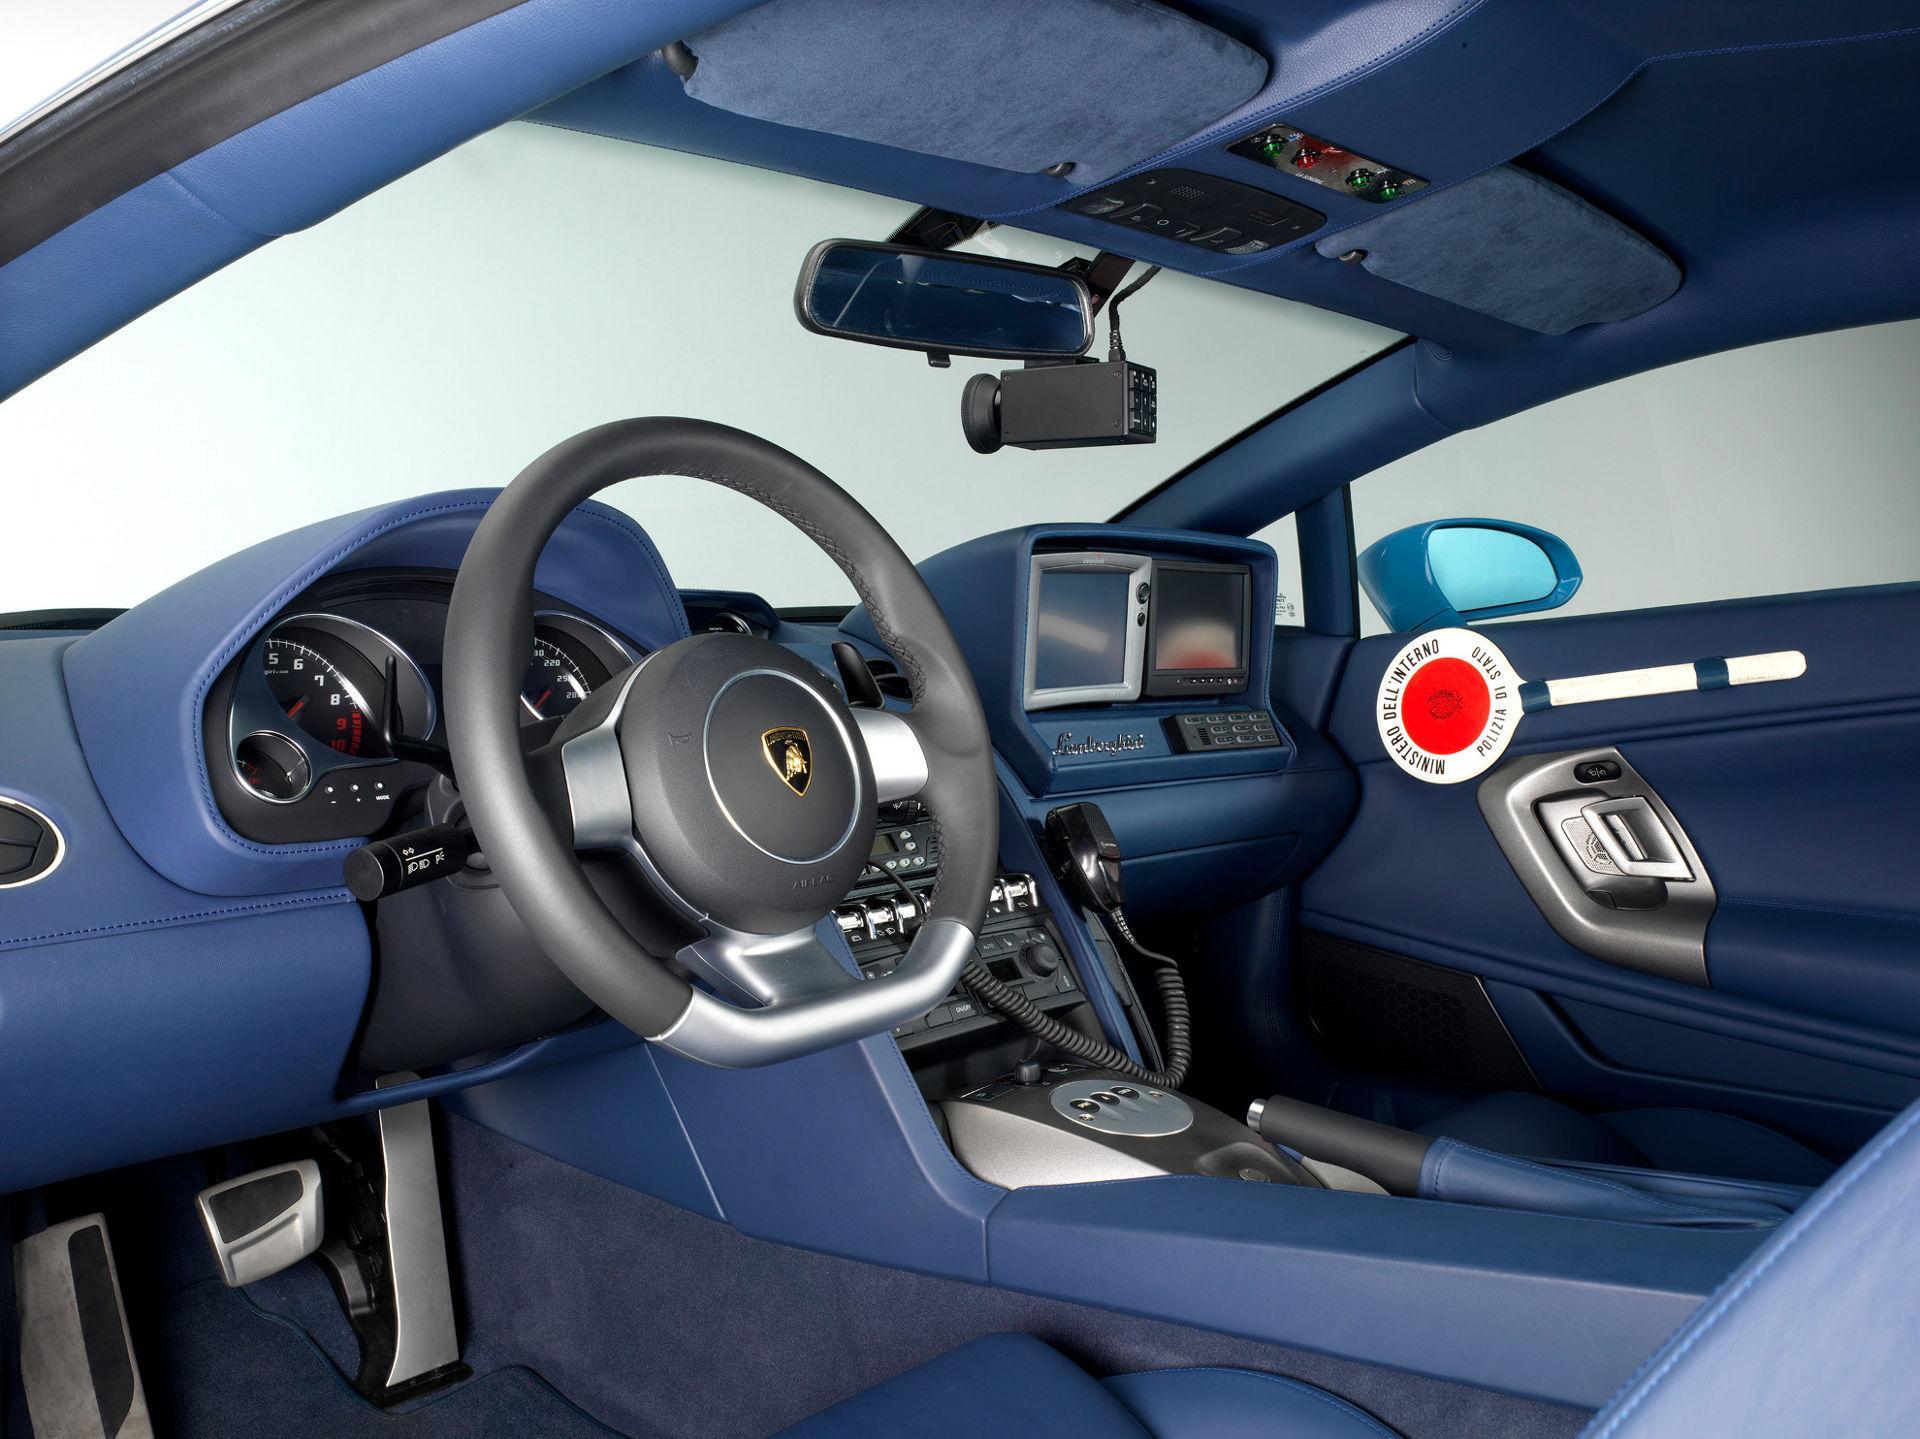 Lamborghini Gallardo LP 560-4 Polizia - Innenraum